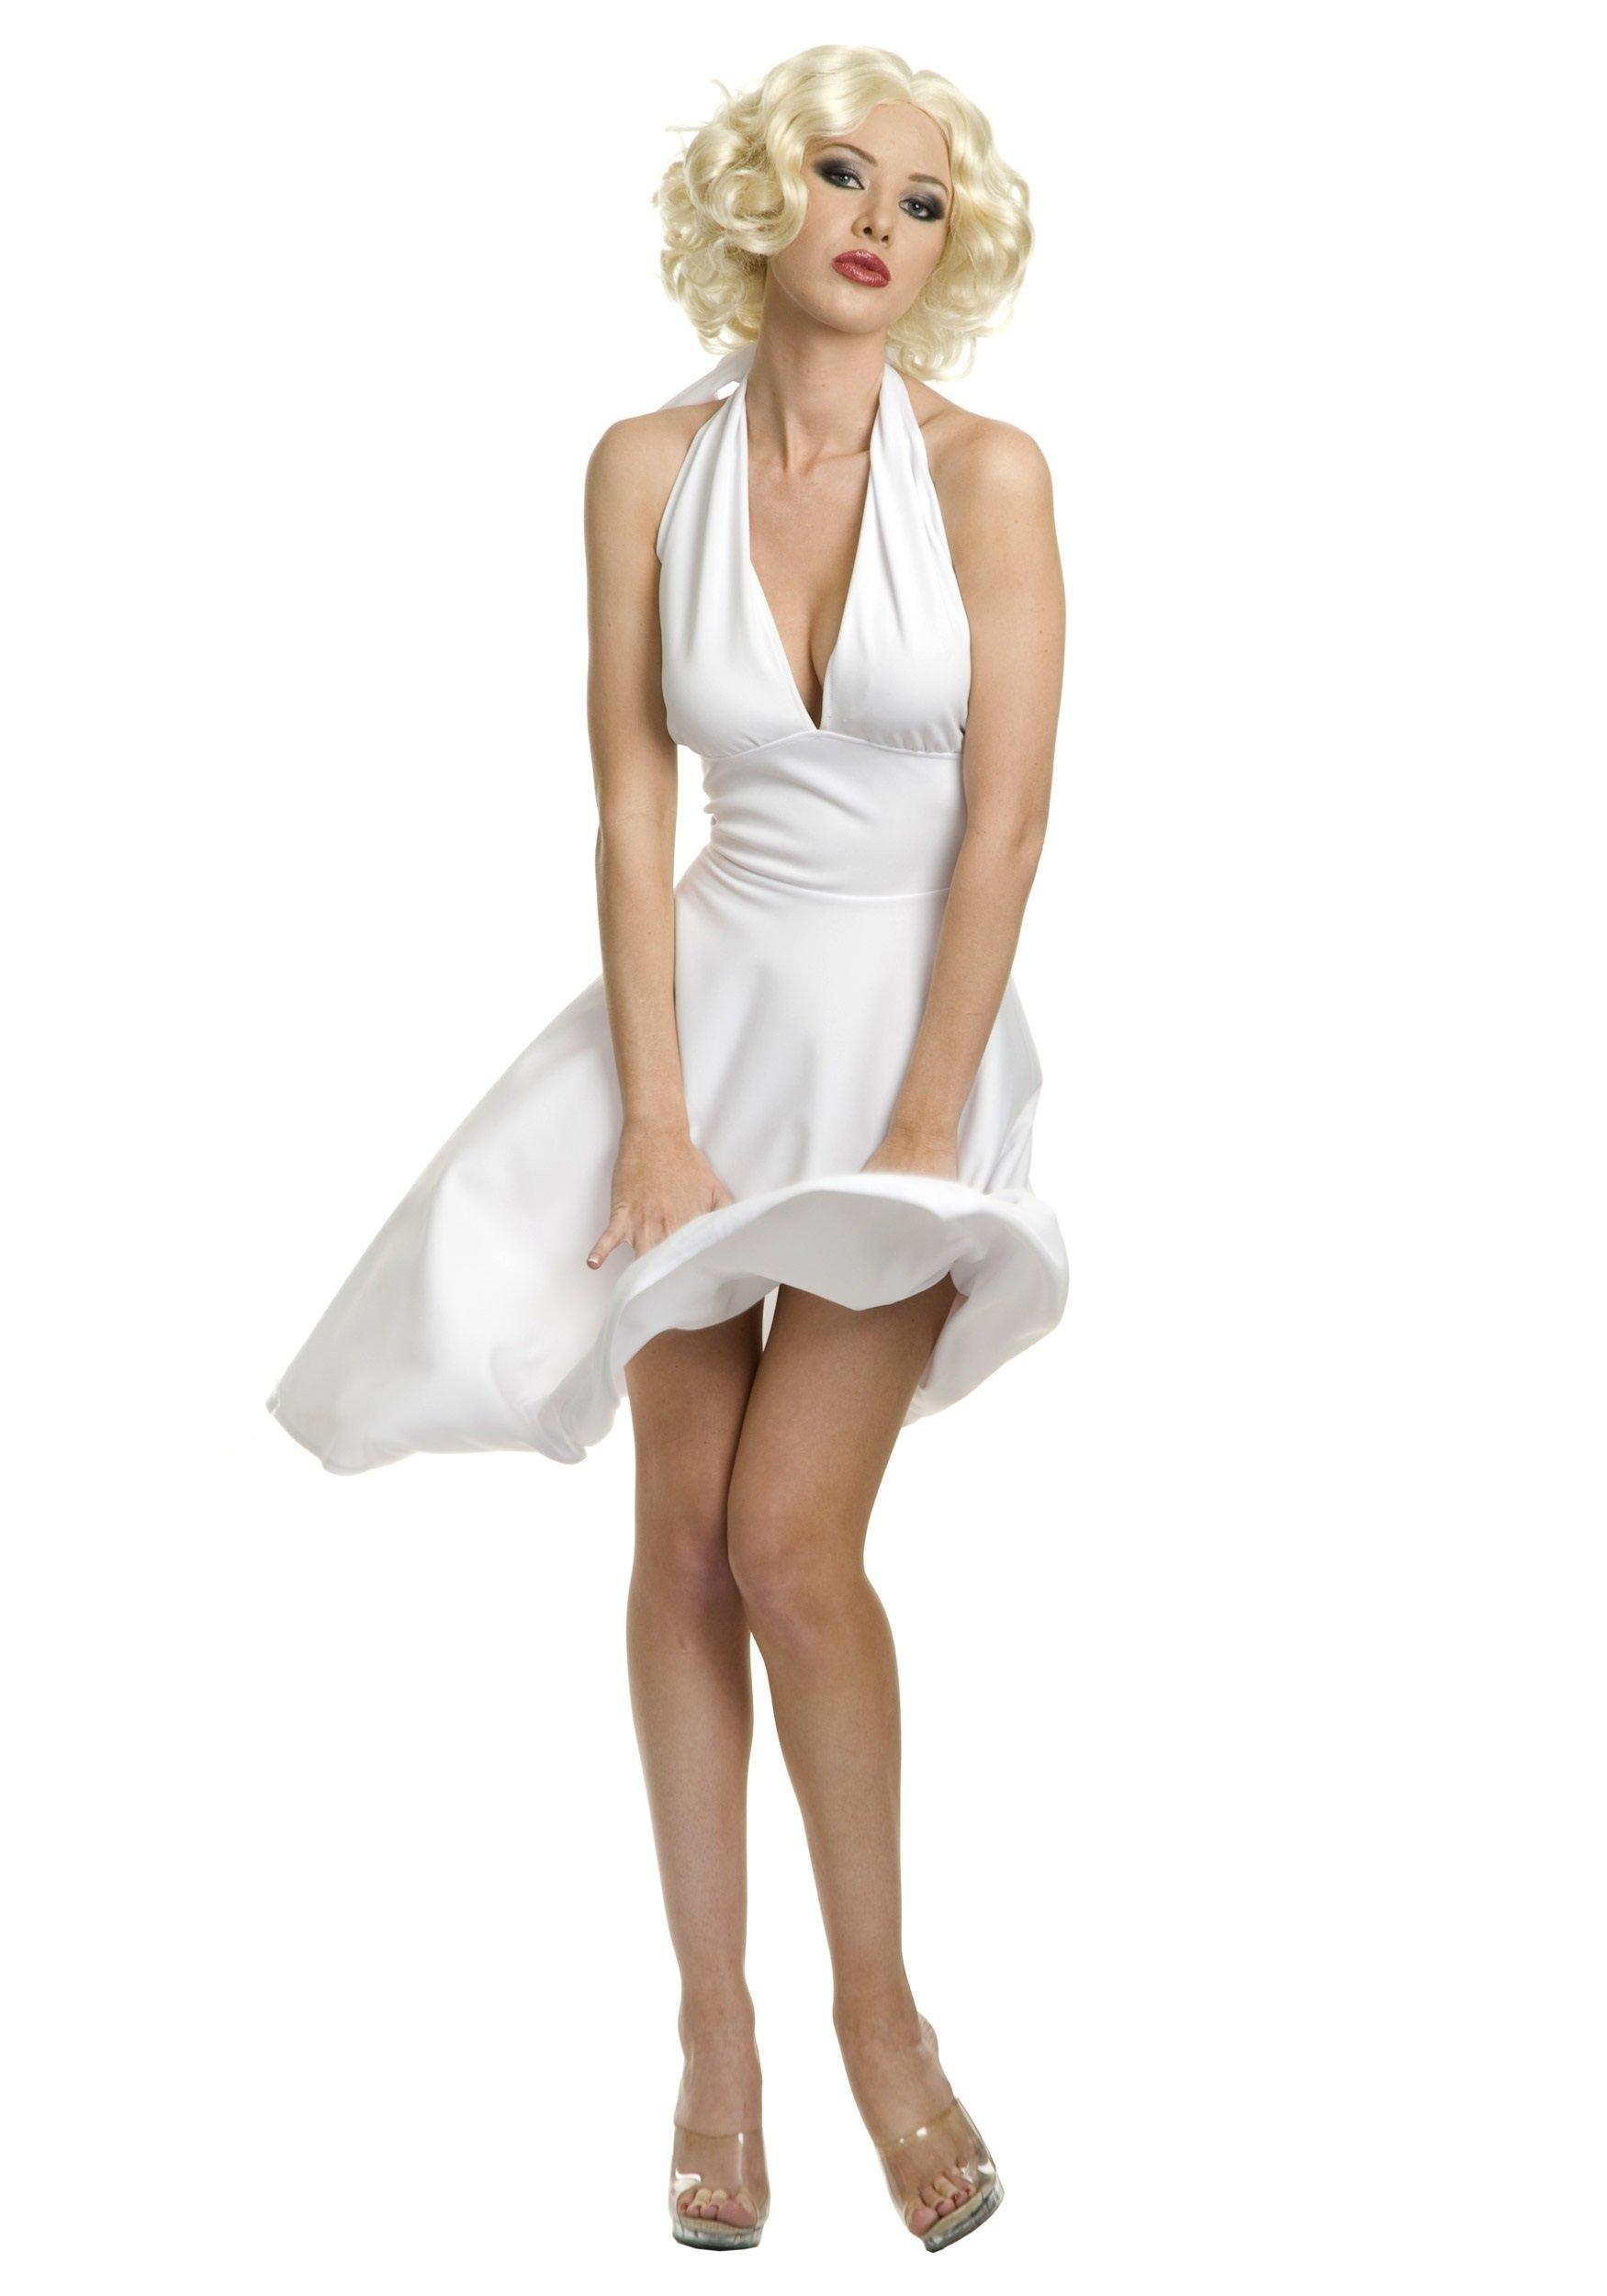 plus size marilyn halter dress - plus size marilyn monroe costume